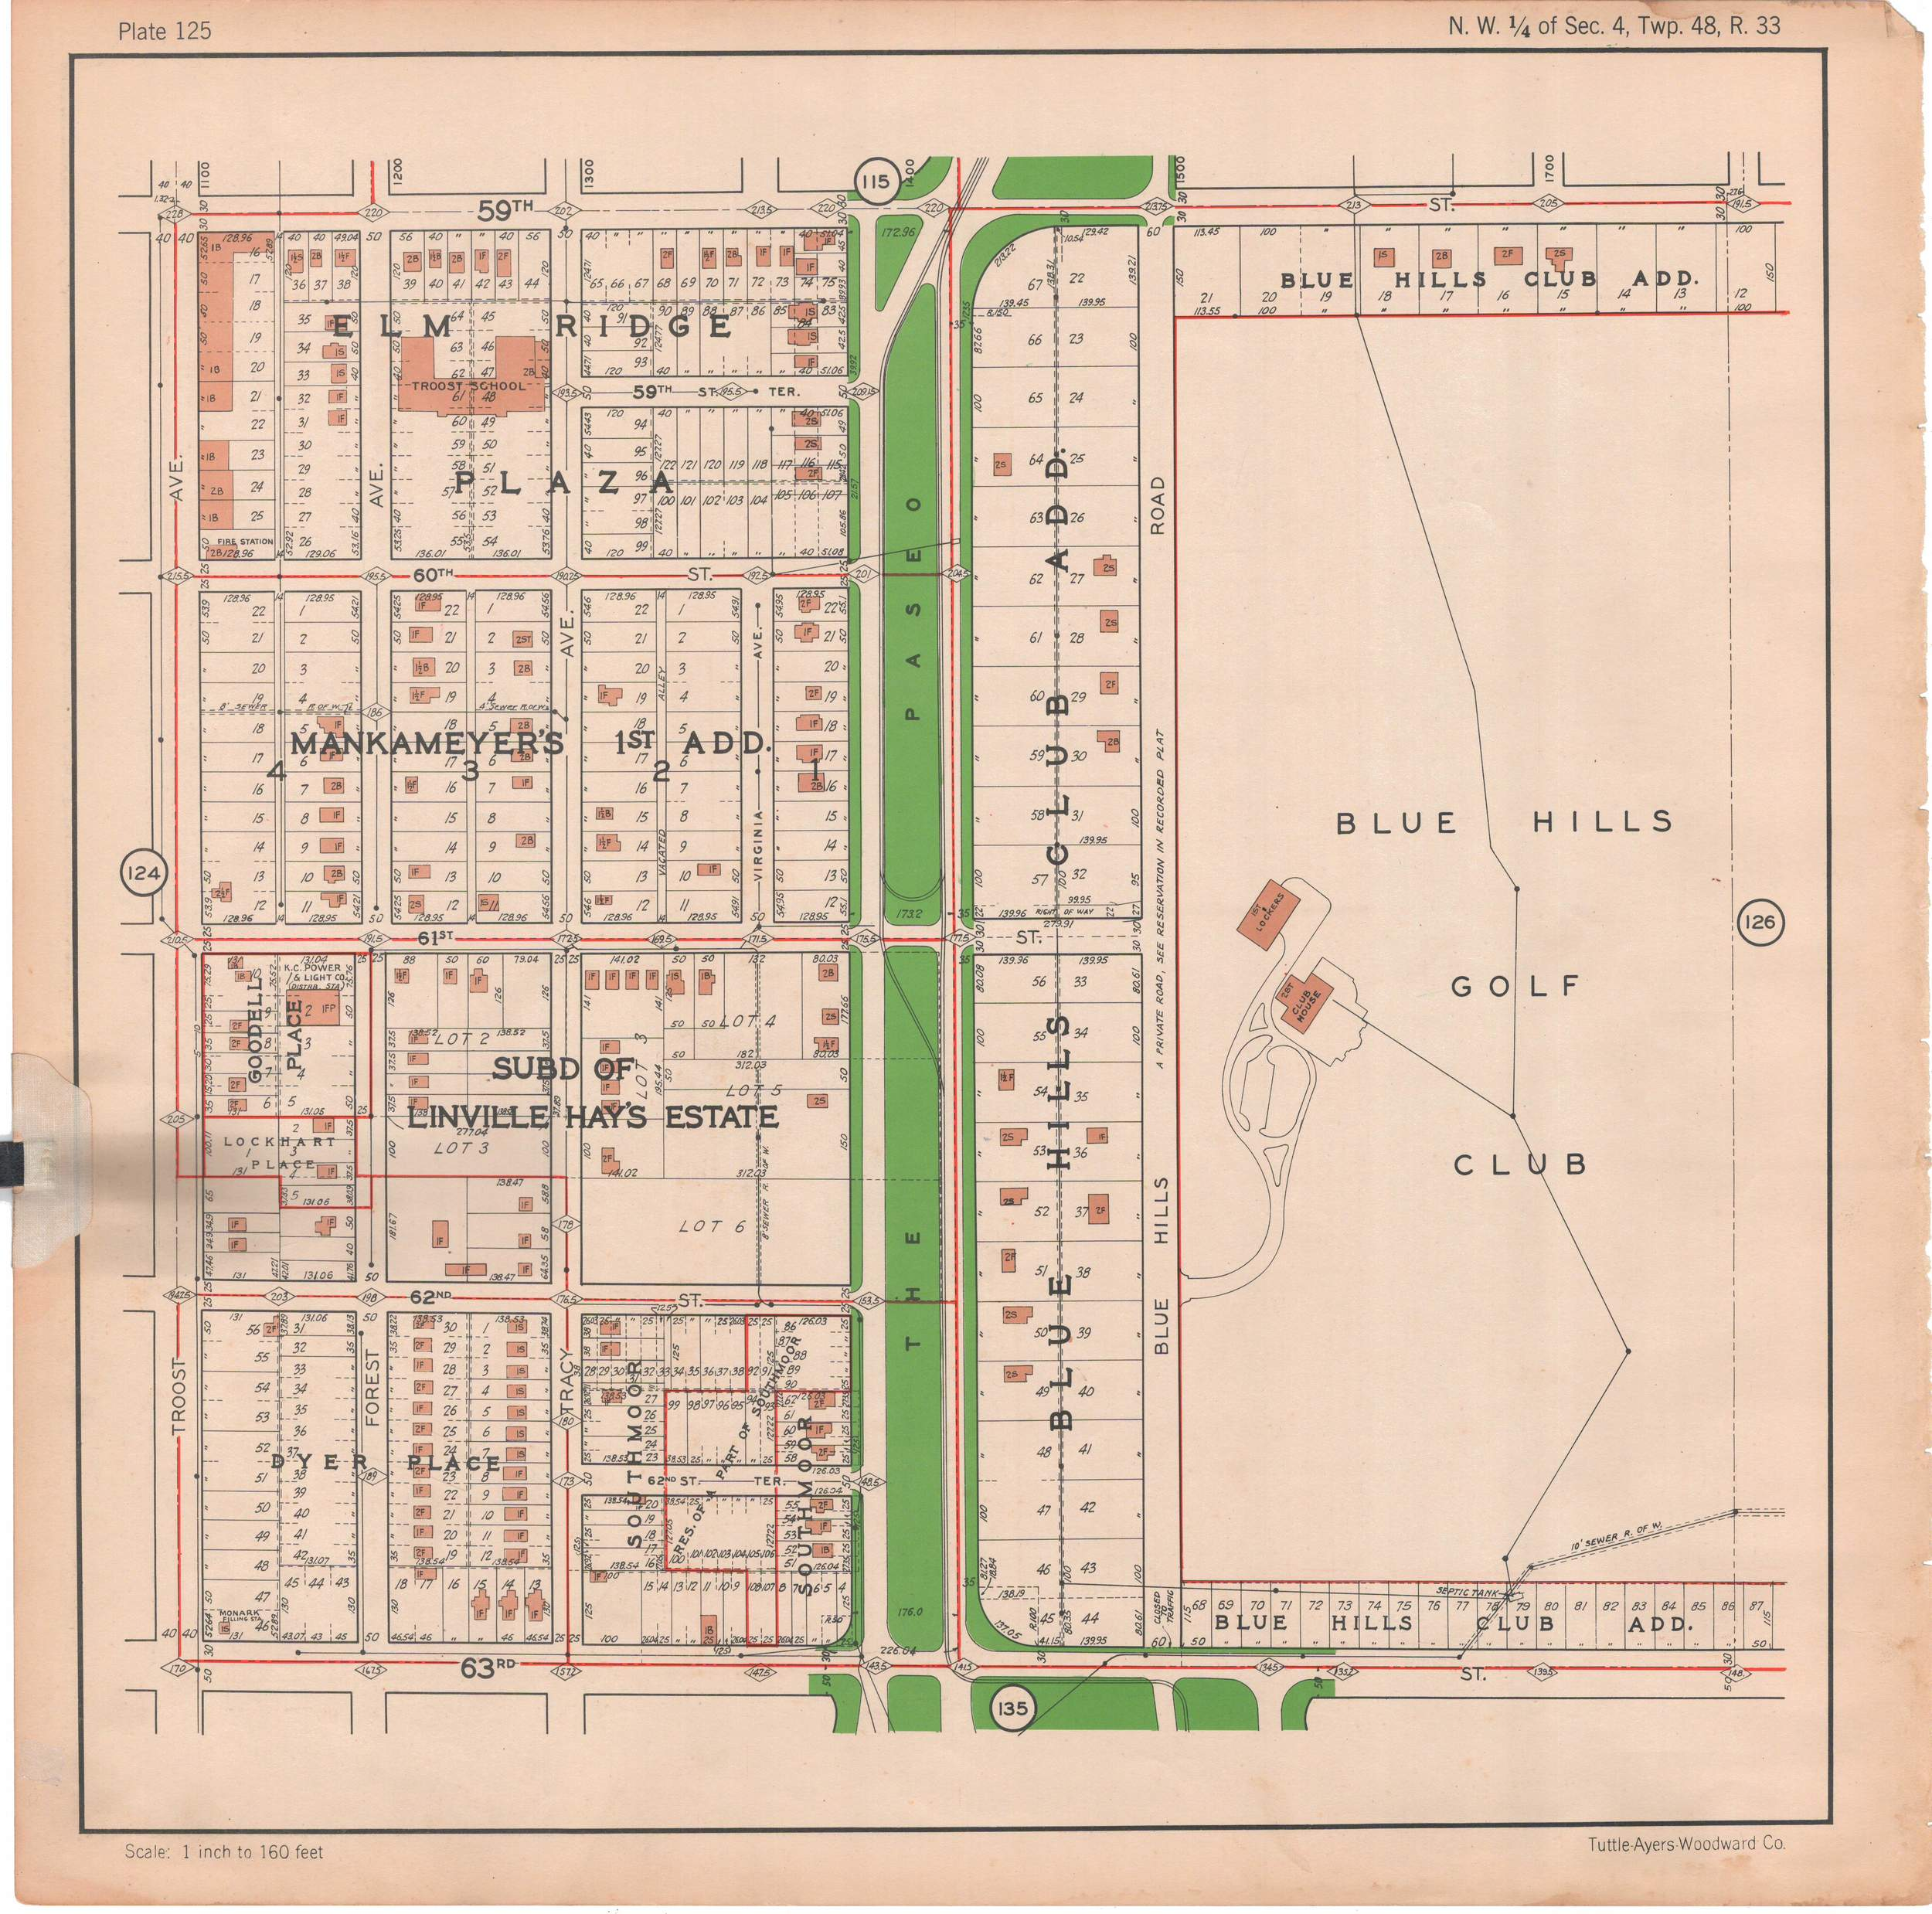 1925 TUTTLE_AYERS_Plate 125.JPG